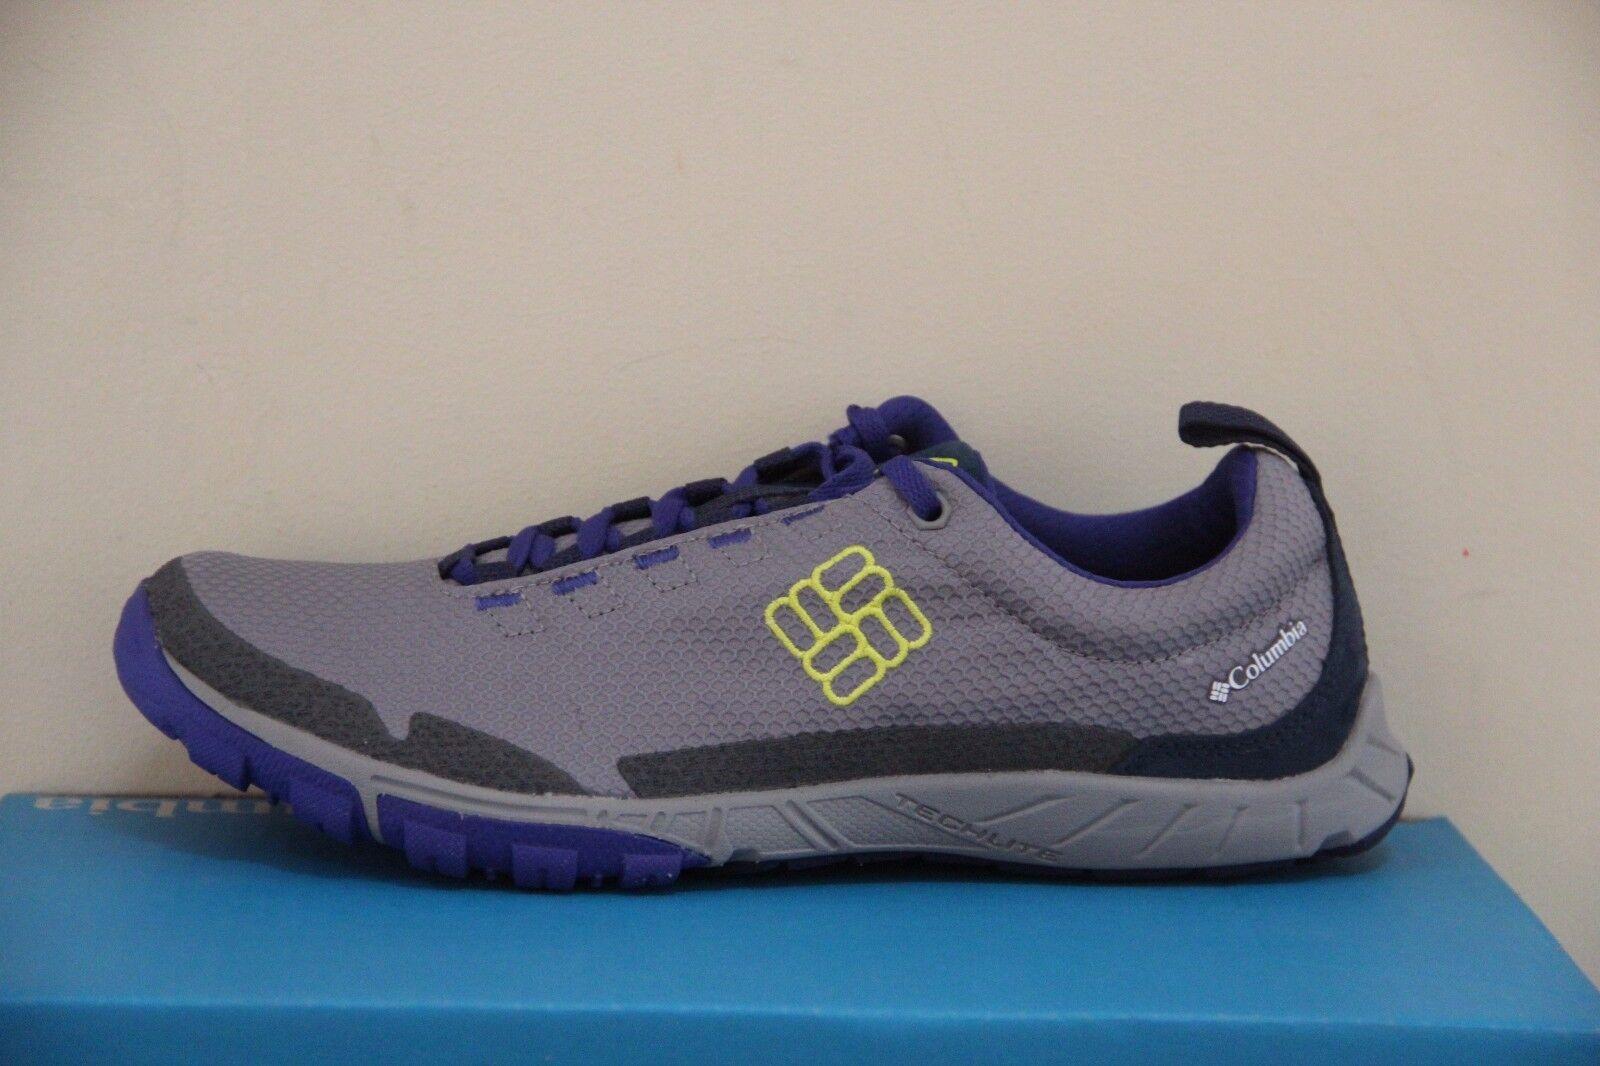 Columbia Damen Flightfoot Schuhgröße 9.5 Neu in Box